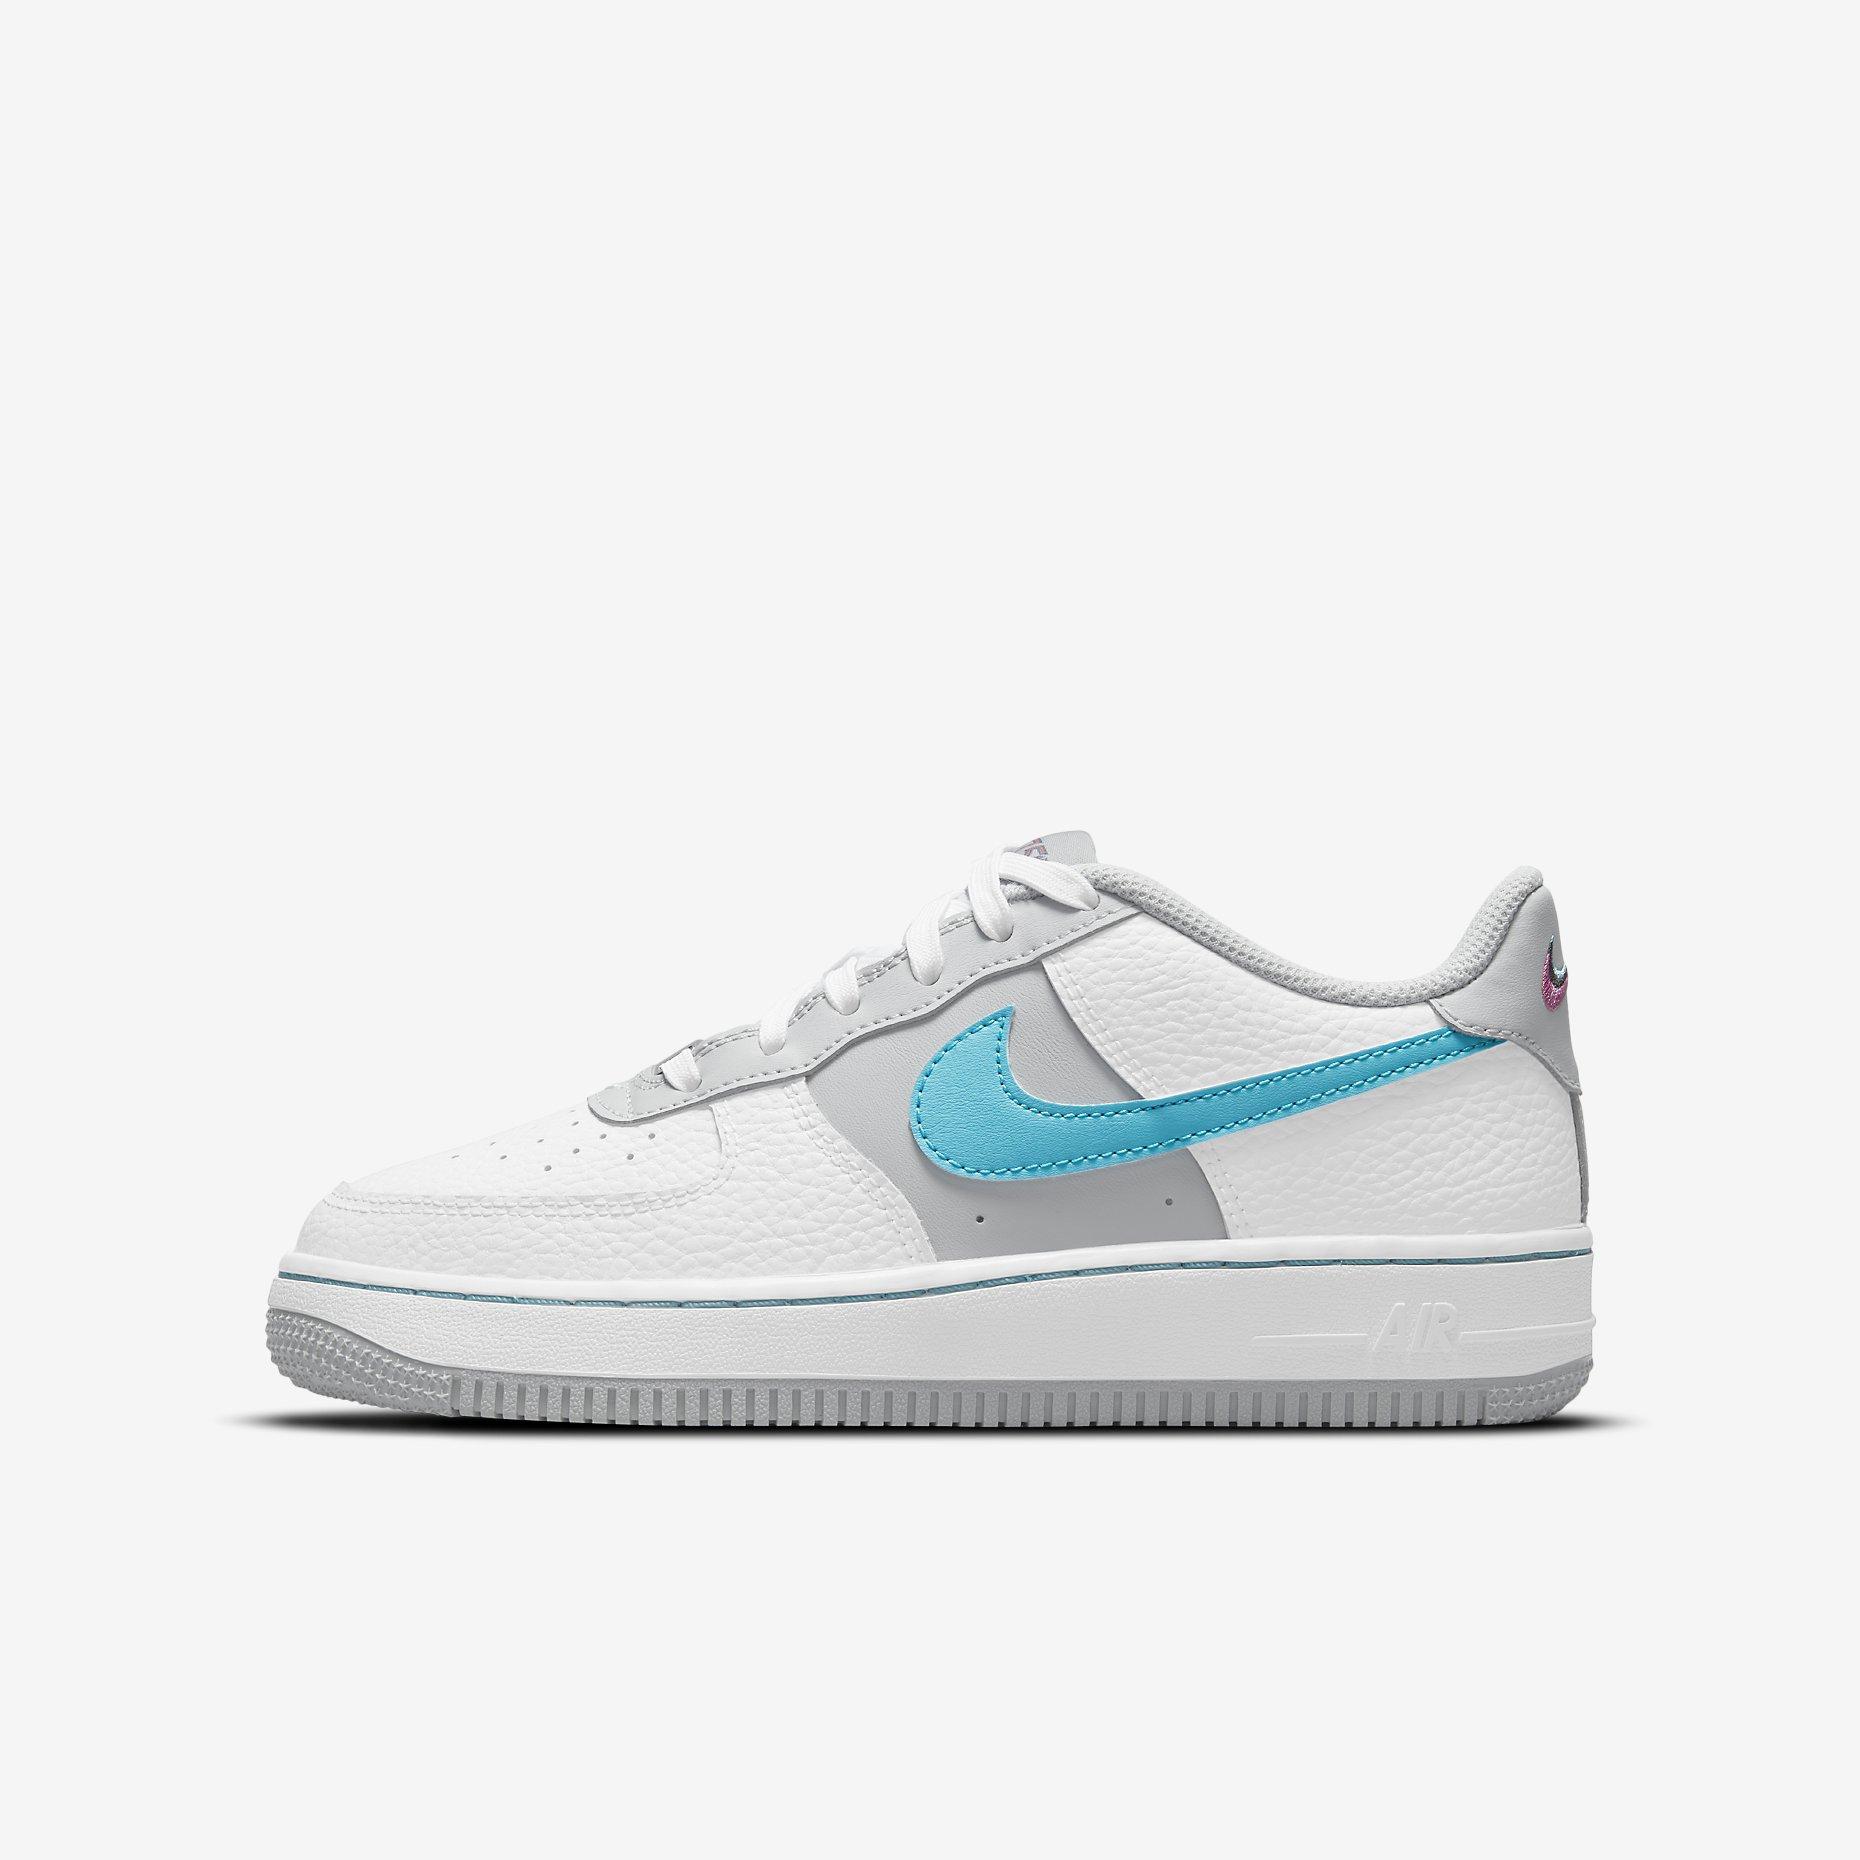 NBA x Nike Air Force 1 GS 'White/Grey Fog'